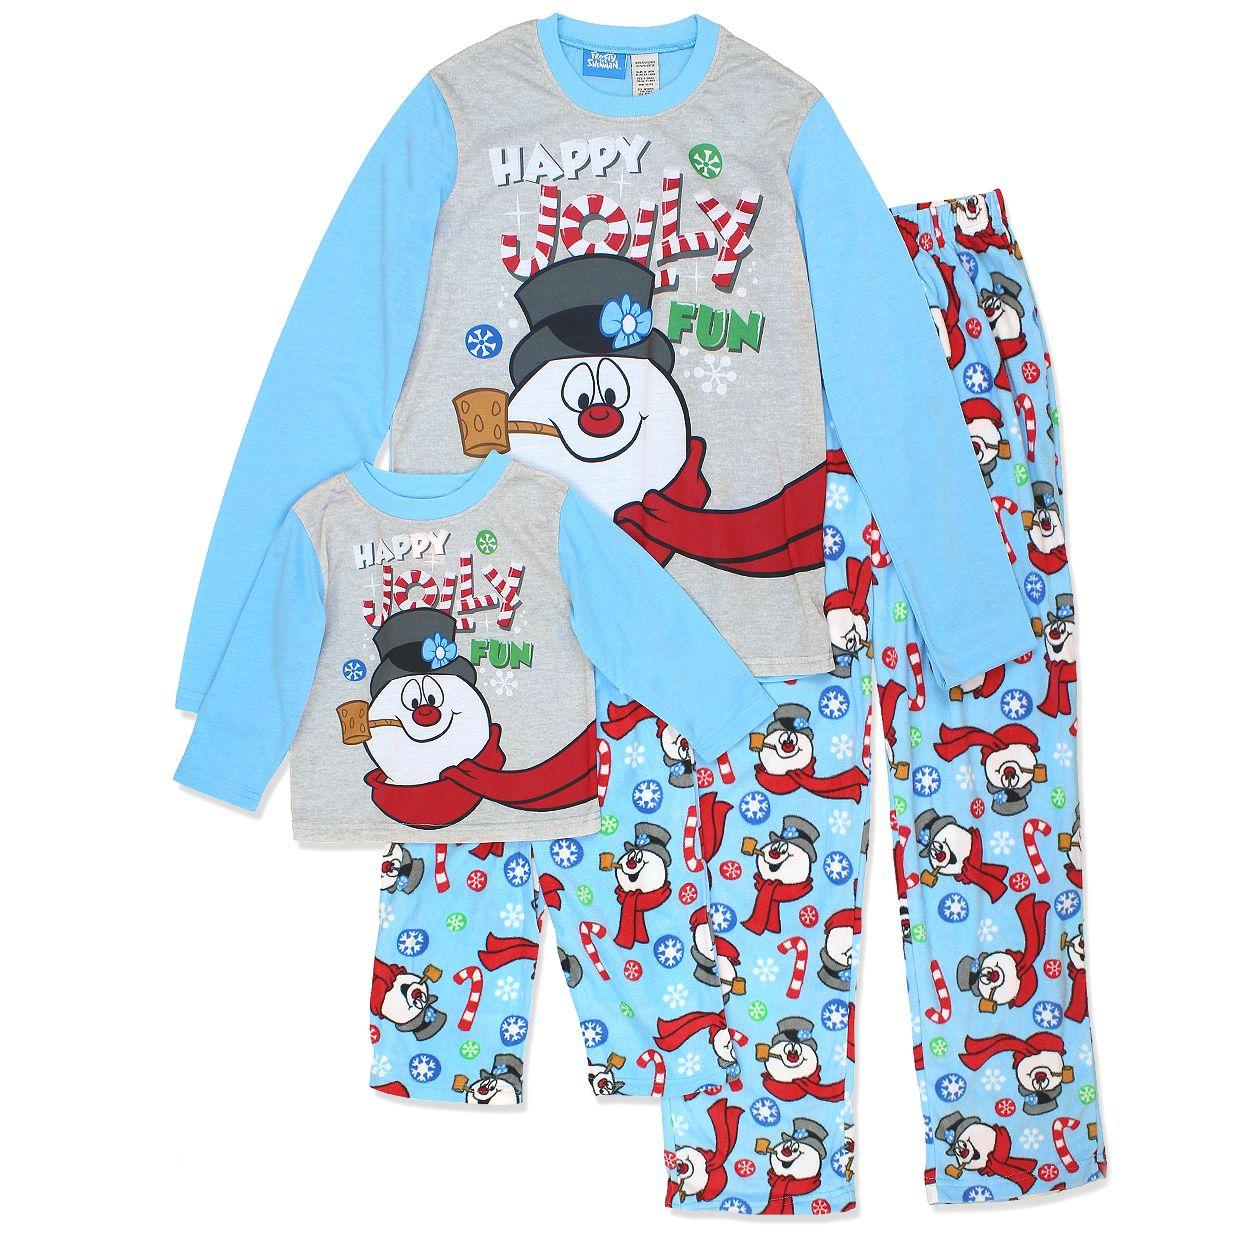 Frosty the Snowman Little Boys Christmas Holiday Family Pajama Set